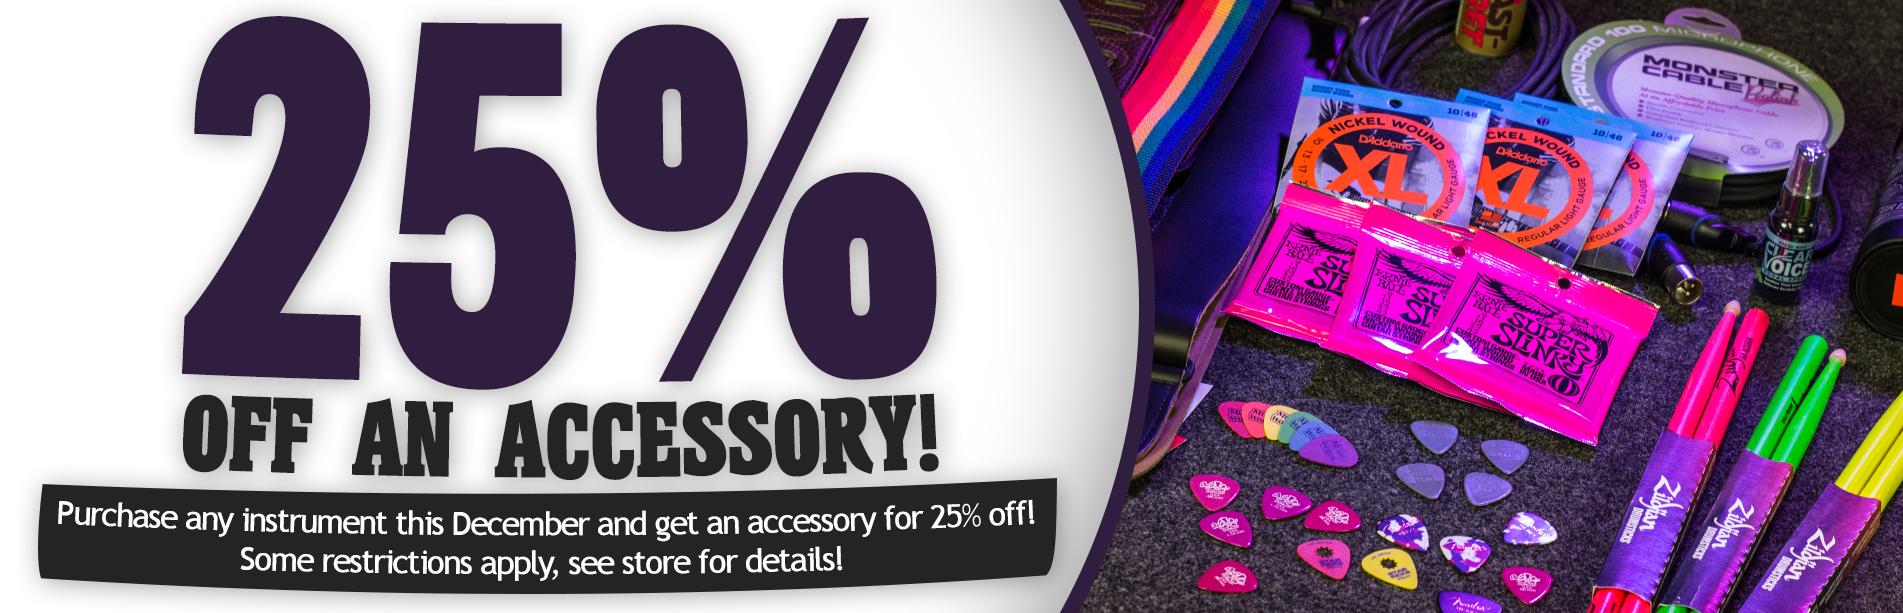 25-percent-off-accessories-3